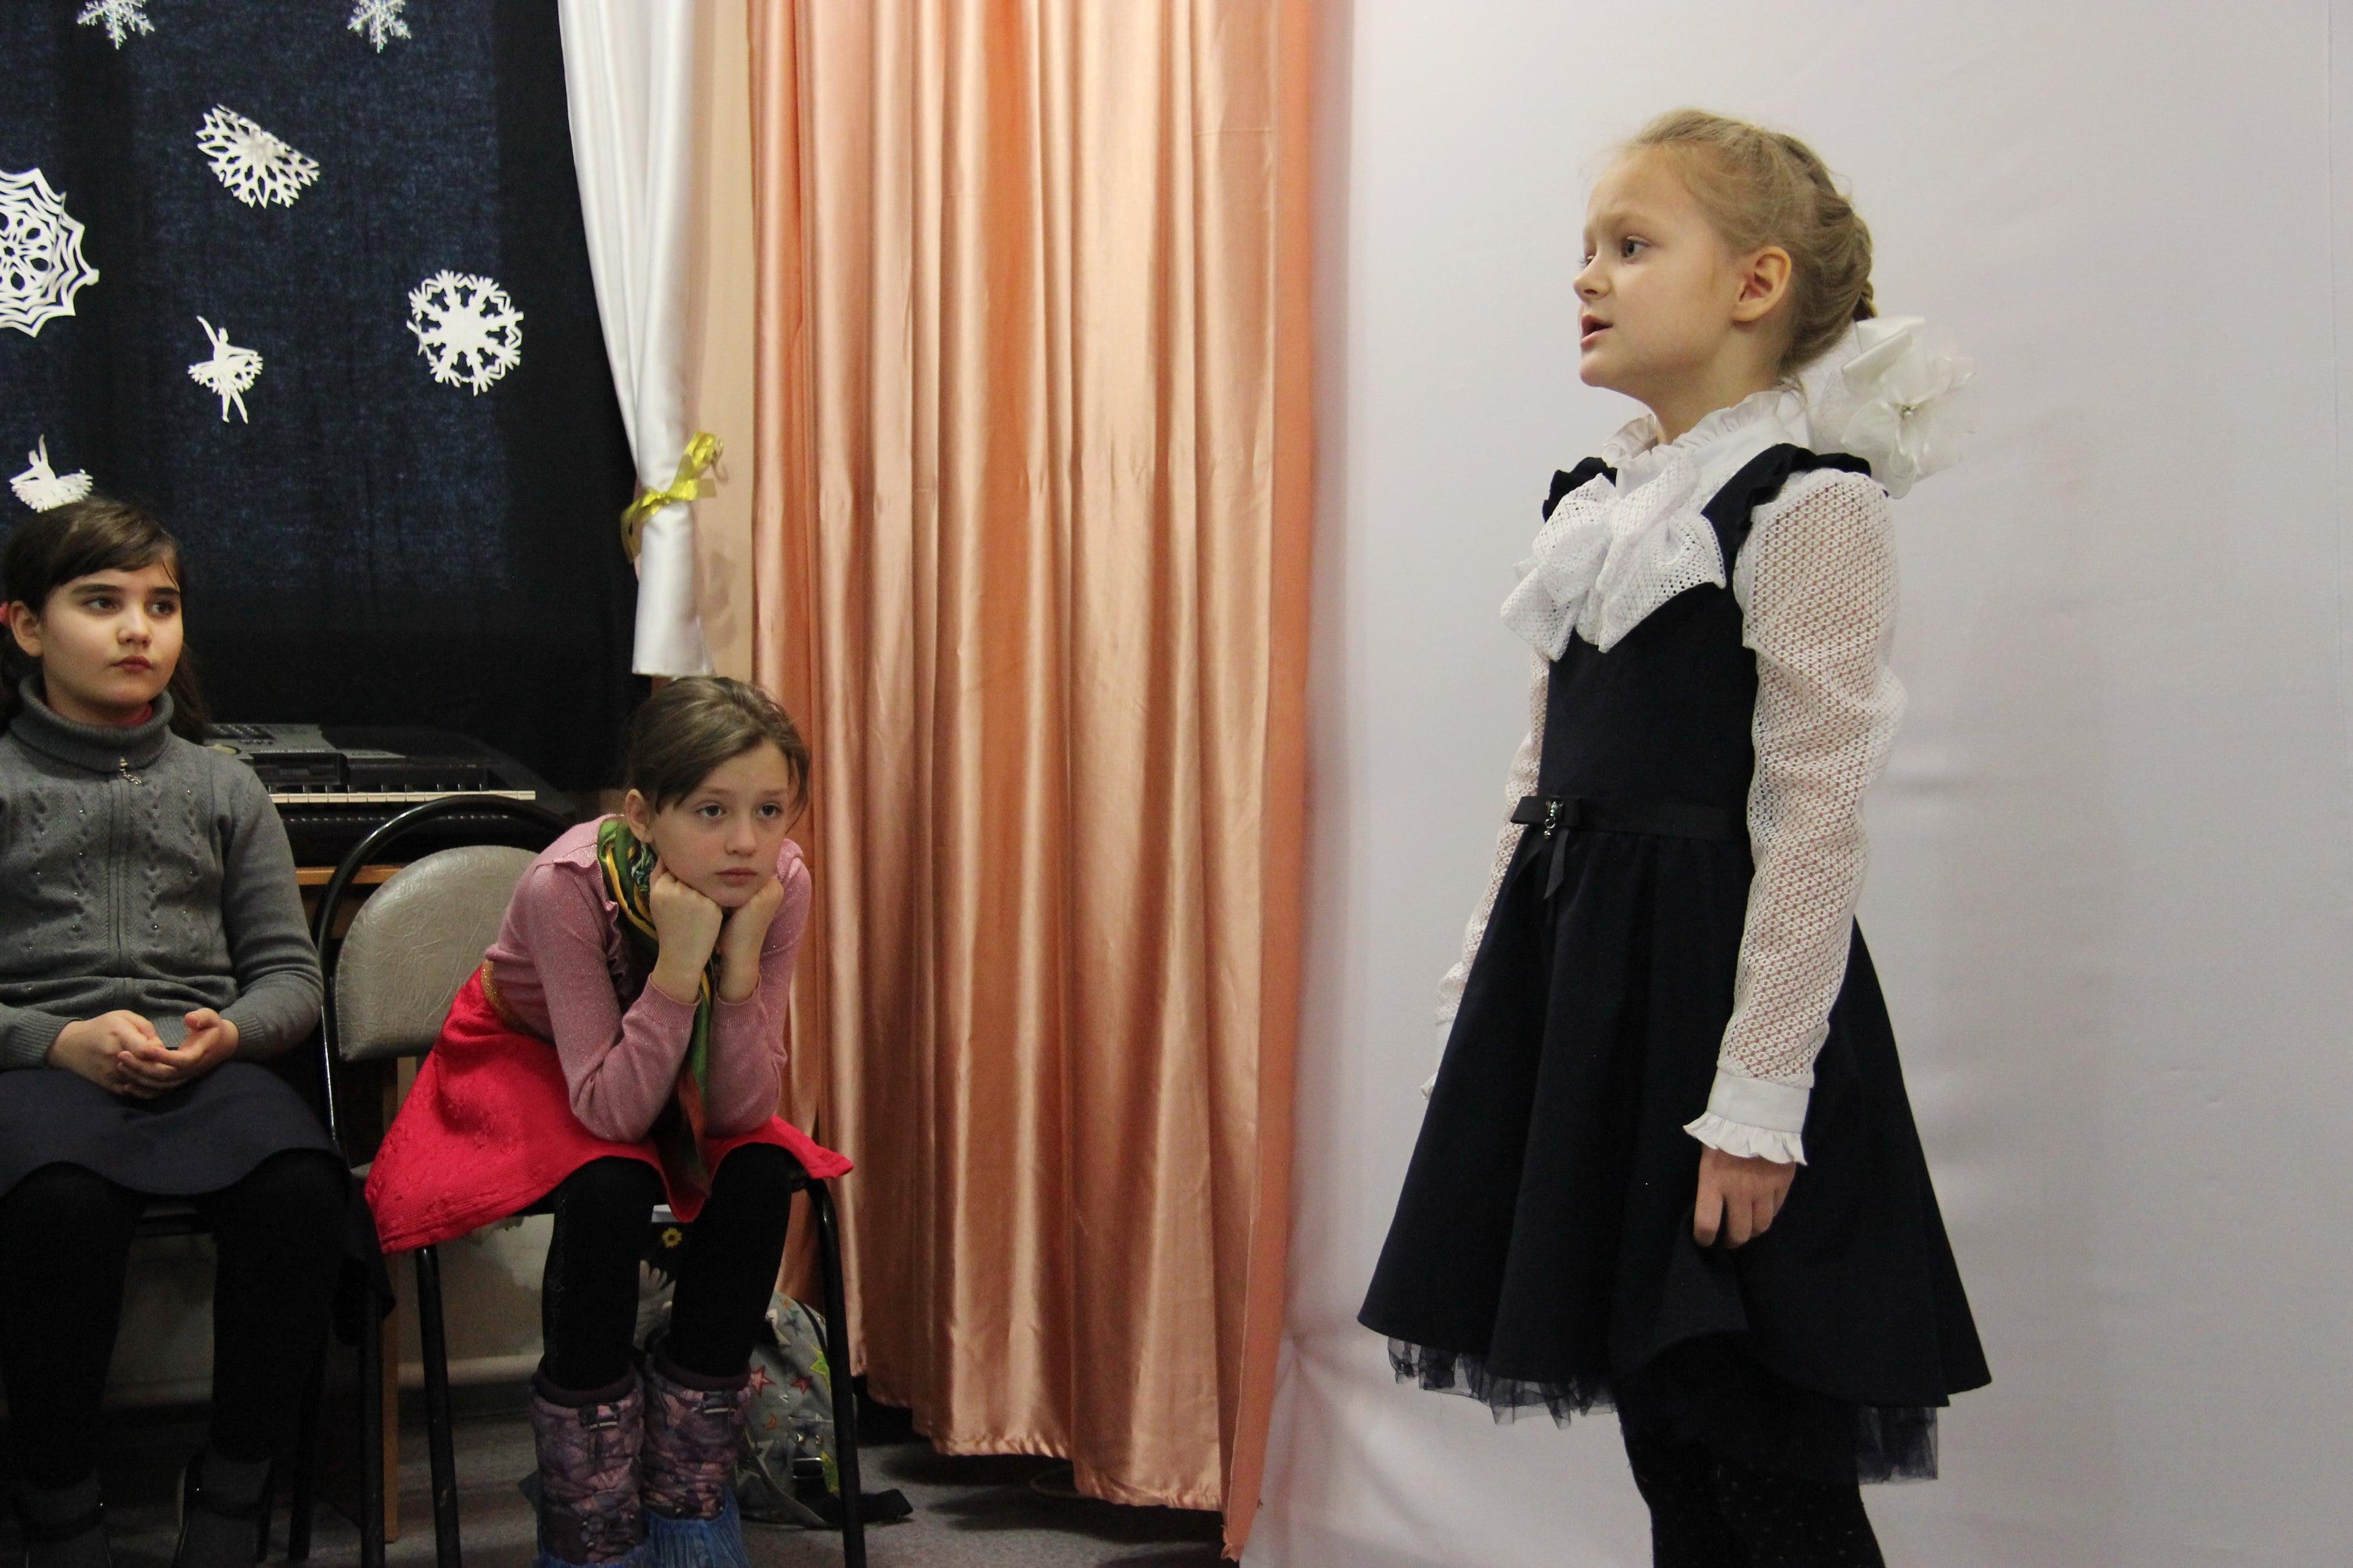 http://monuspen.ru/photoreports/2d5329c447a61fd0f910bf1d53ea8441.JPG